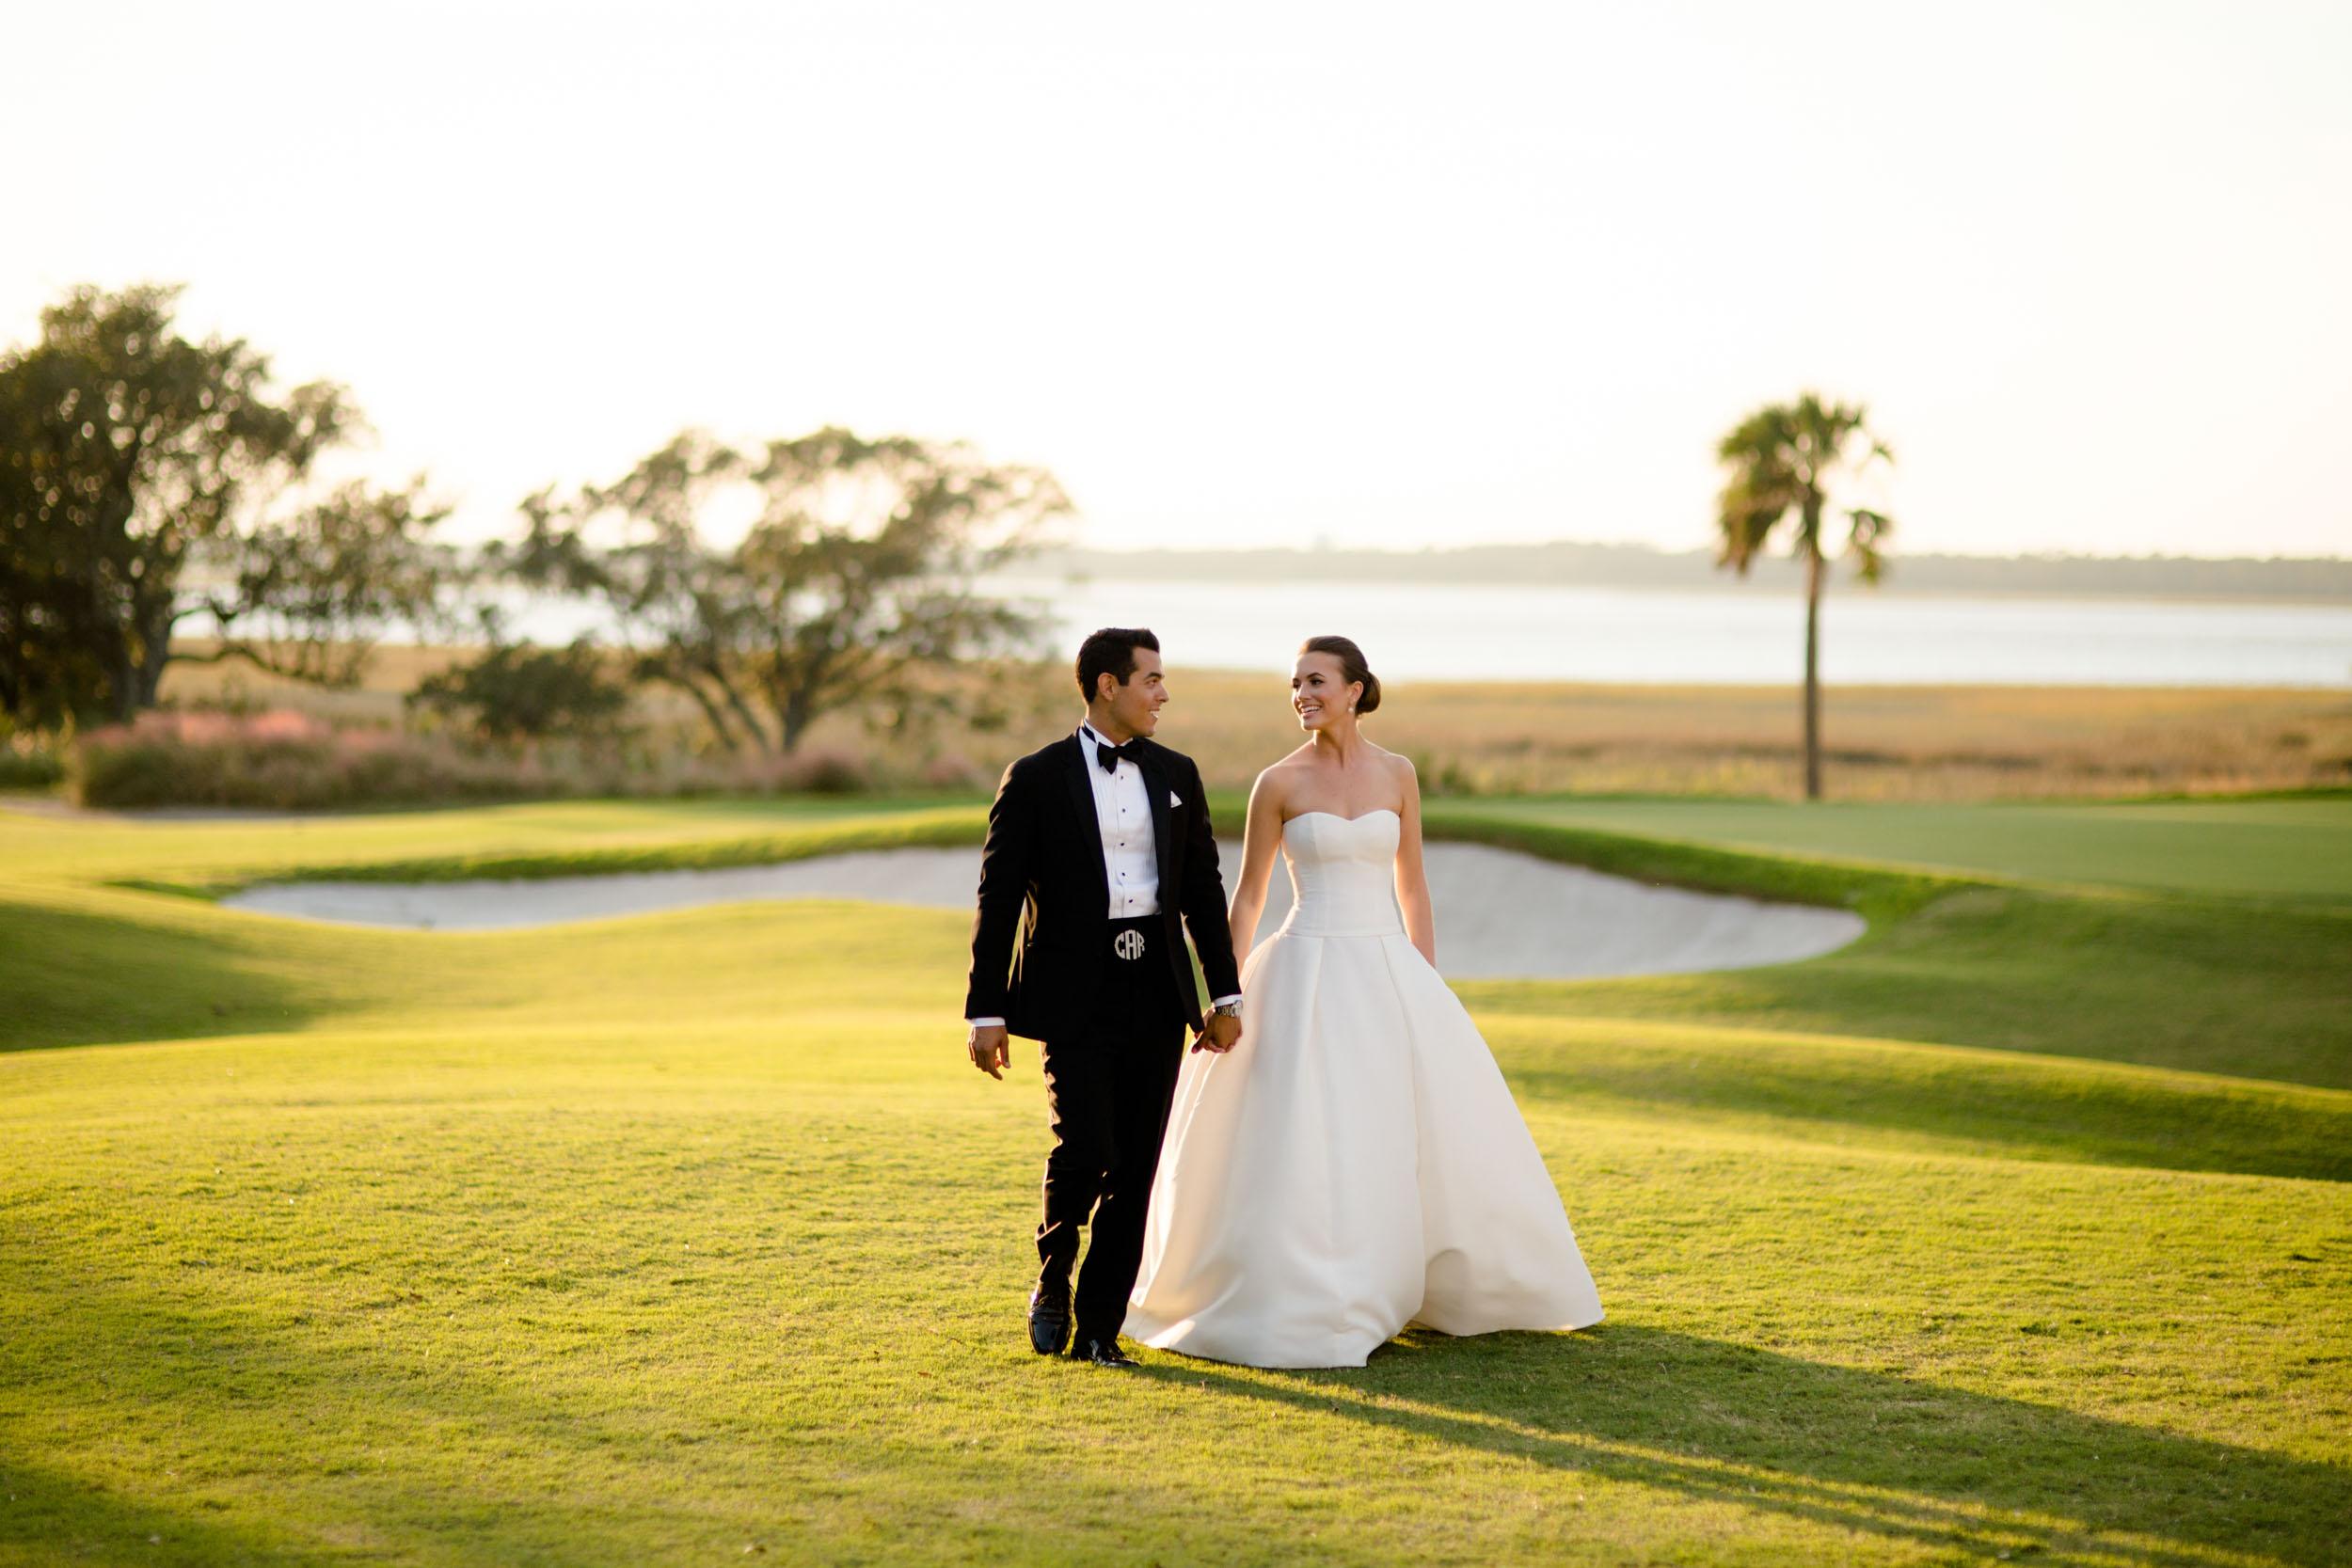 South Carolina wedding photography on the River Course of the Kiawah Island Golf Resort